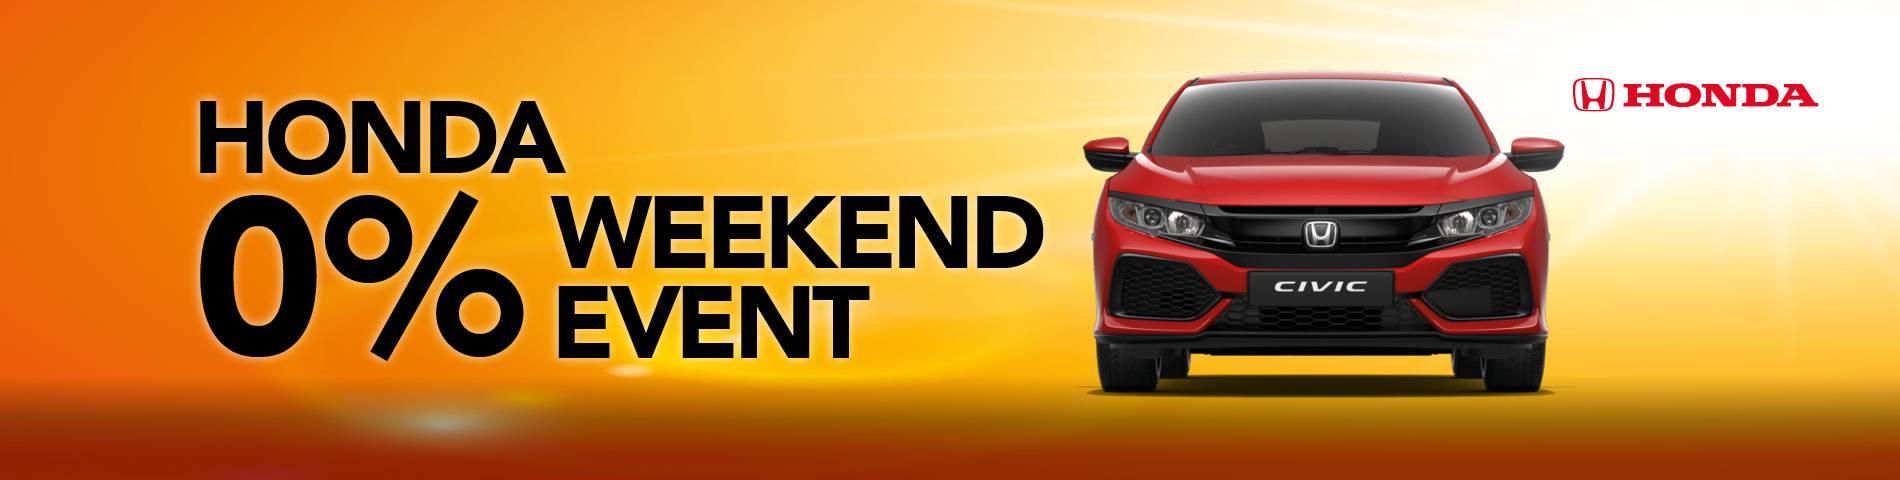 Honda Weekend Event